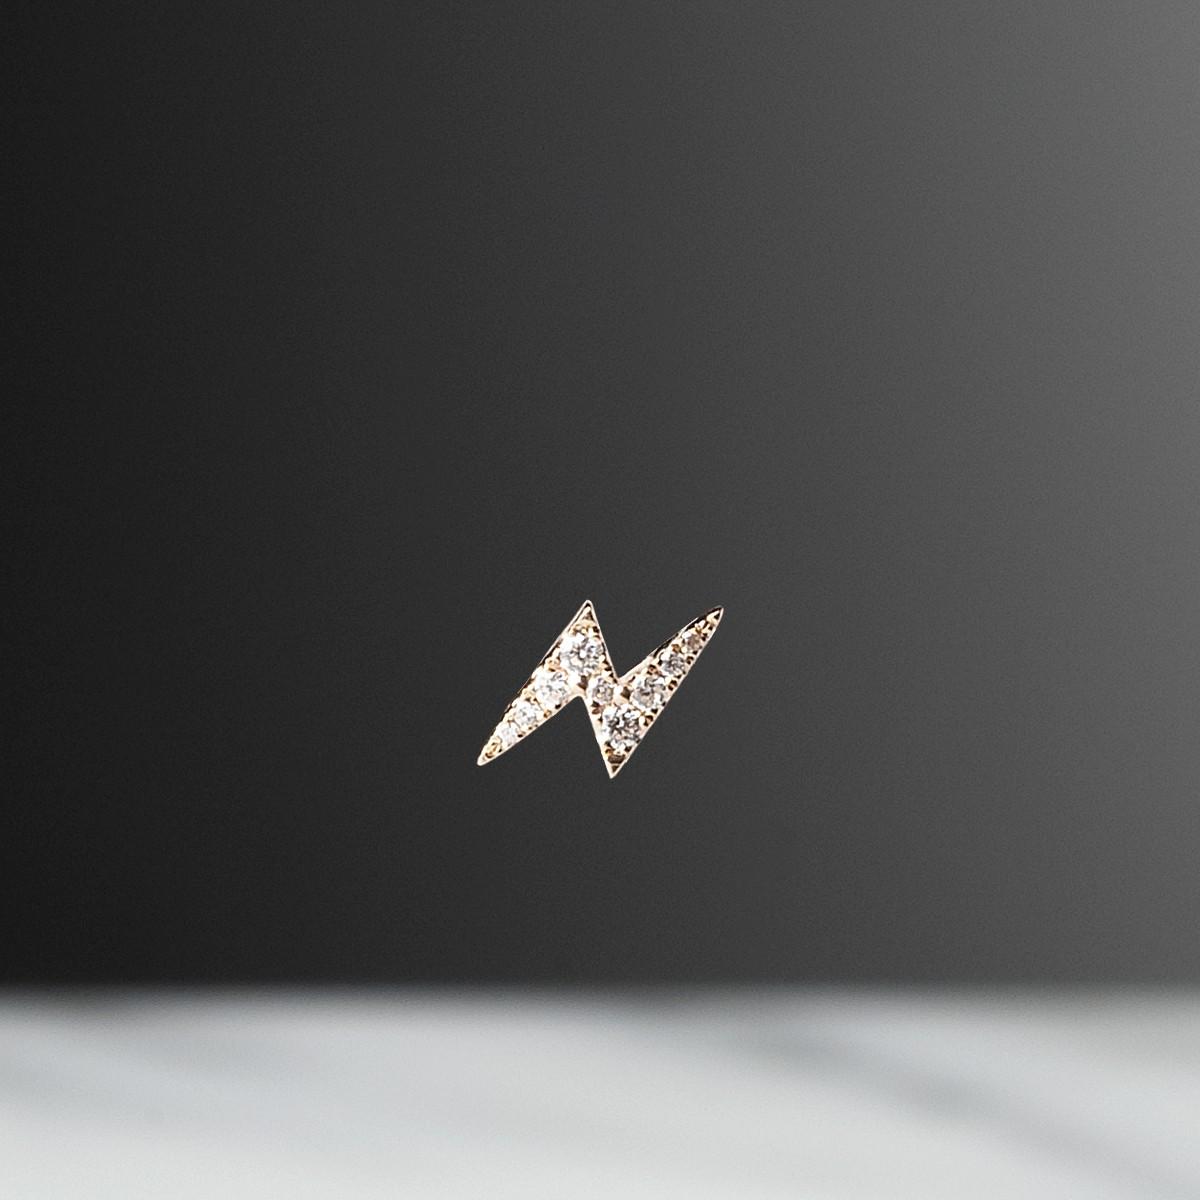 eclair-1960-rose-gold-white-diamond